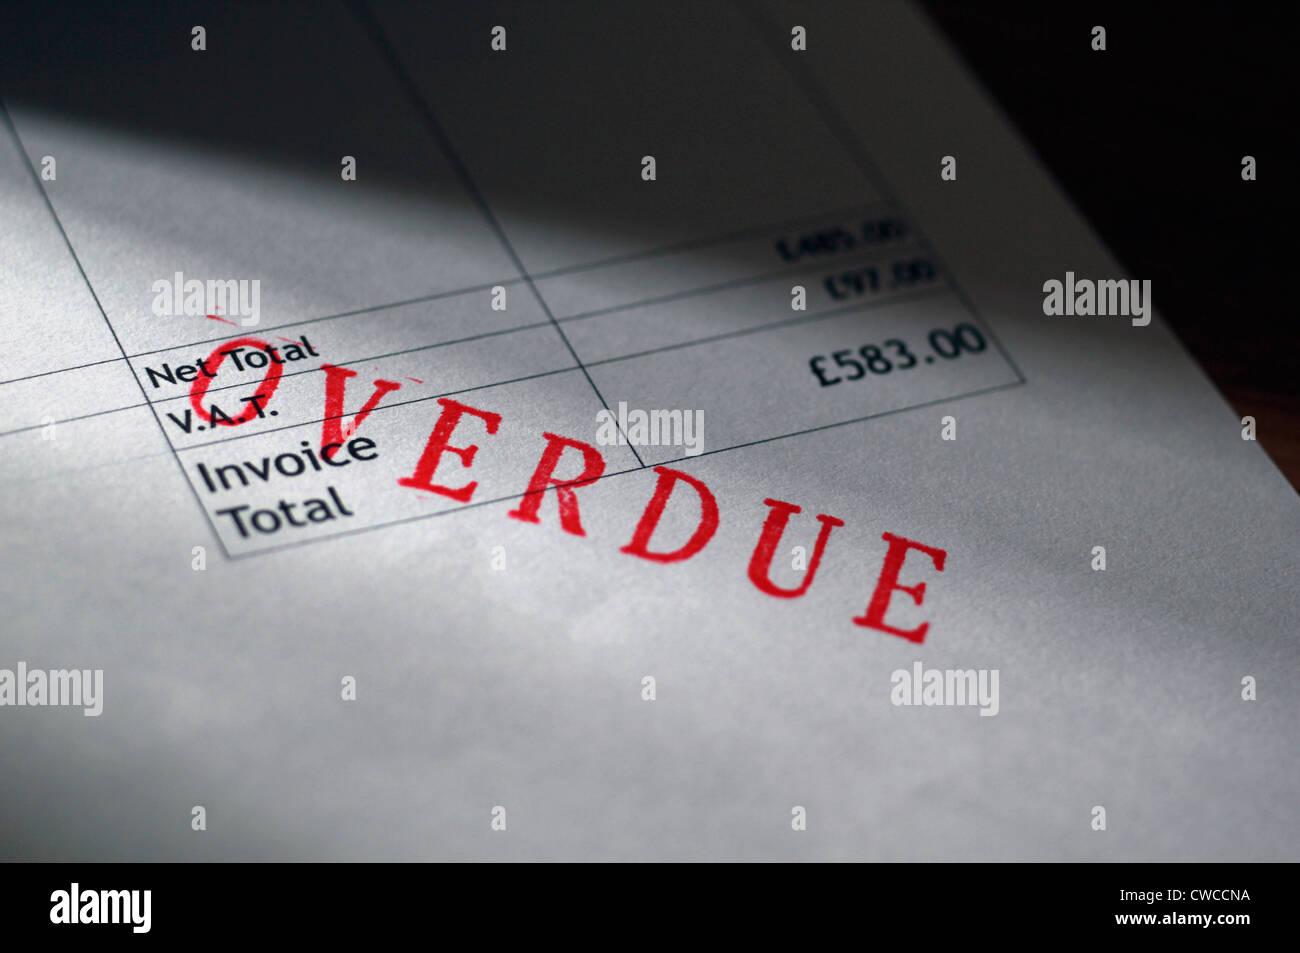 Overdue Invoice - Stock Image